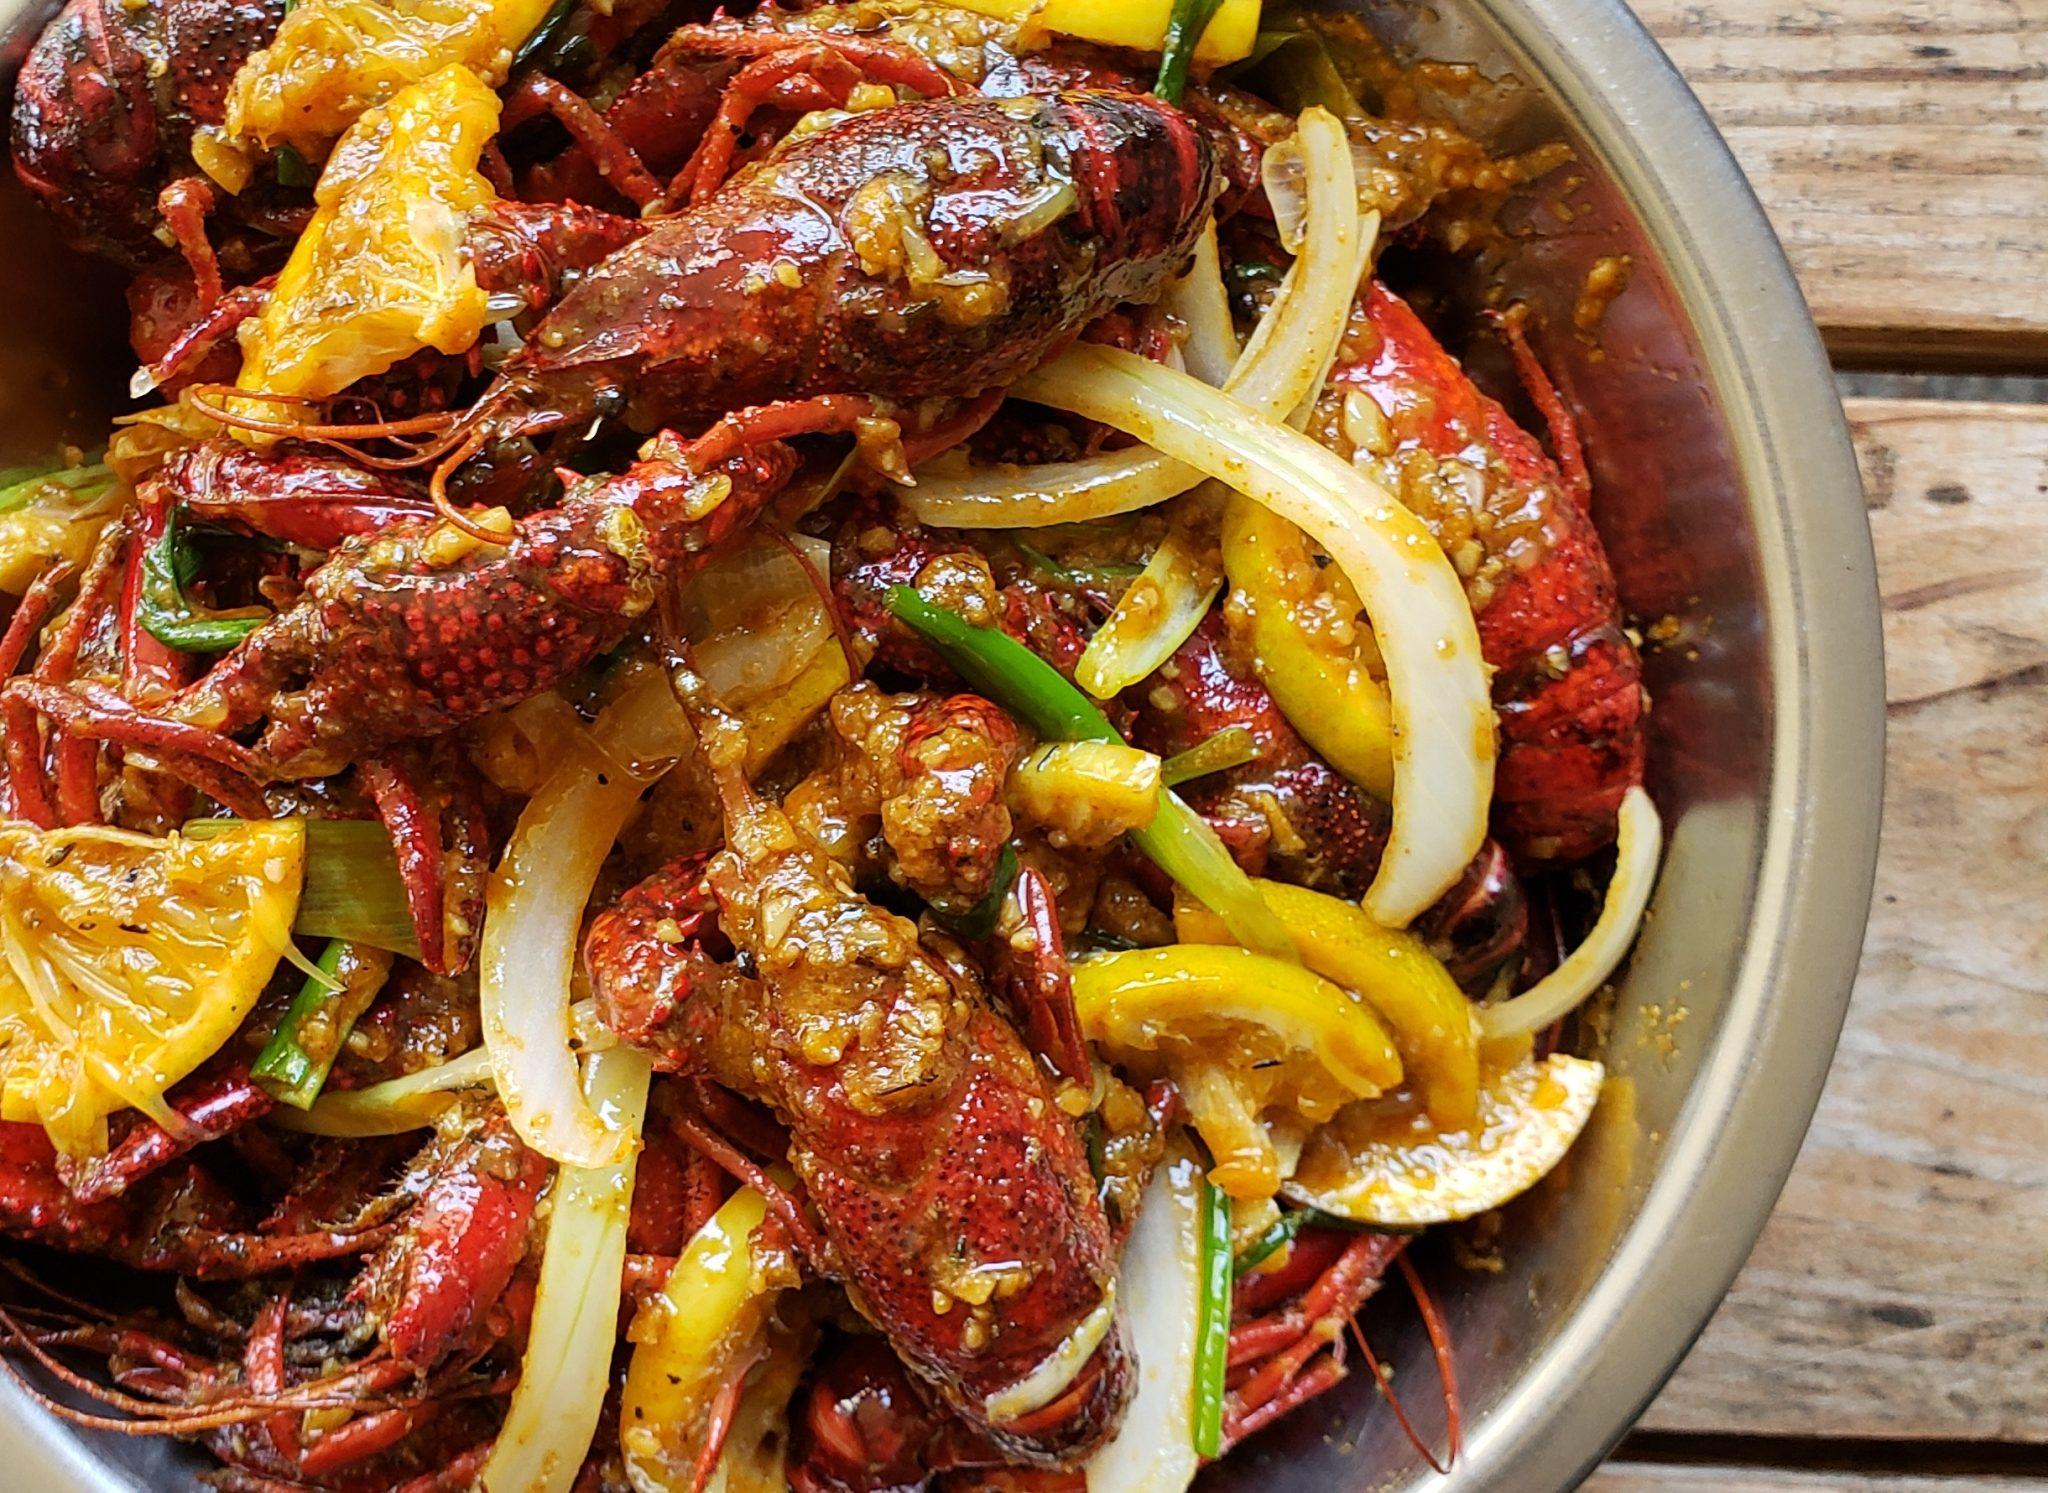 Kitchen Special Crawfish at Cajun Kitchen